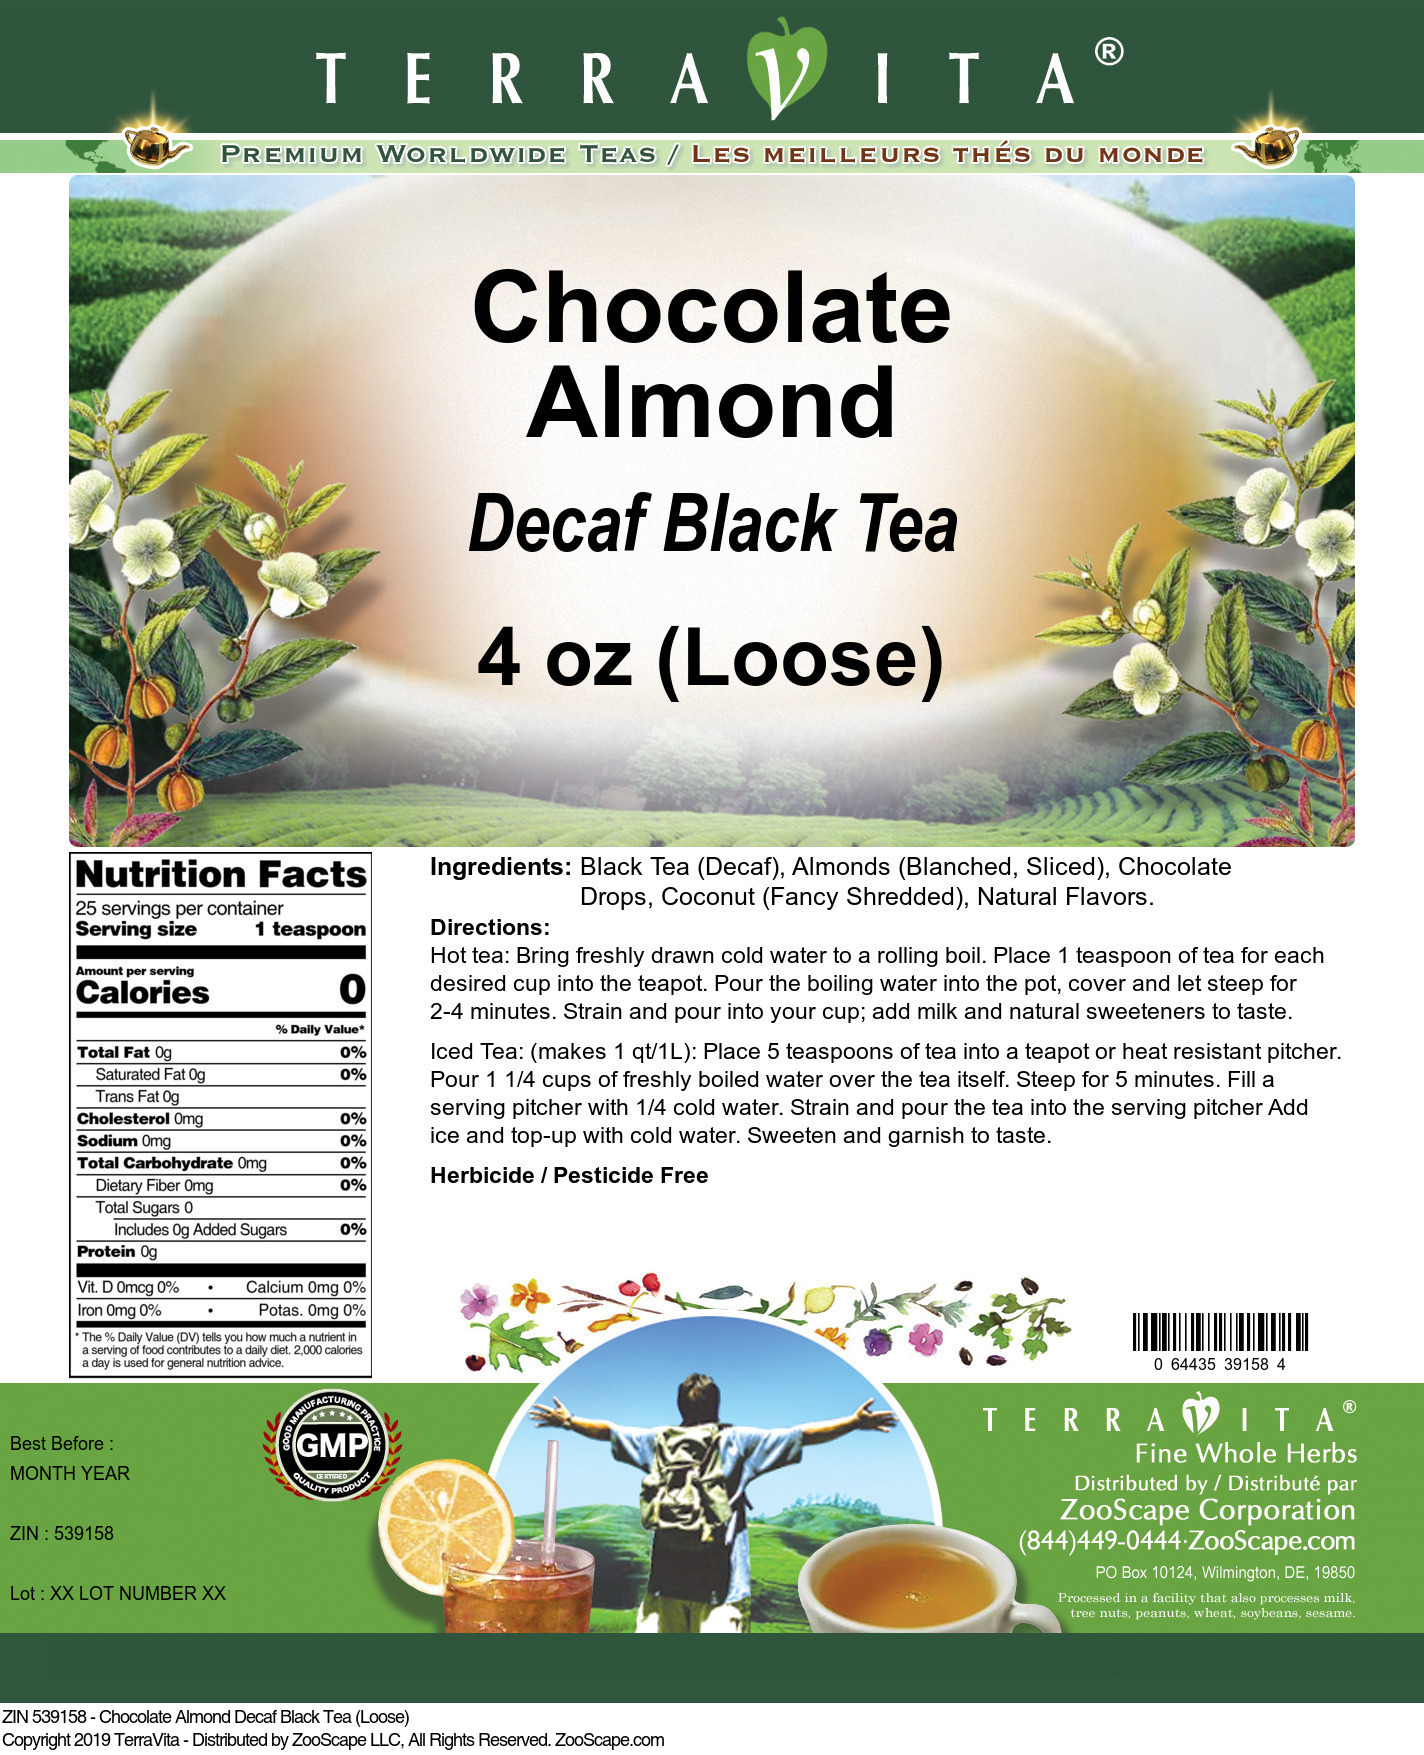 Chocolate Almond Decaf Black Tea (Loose)